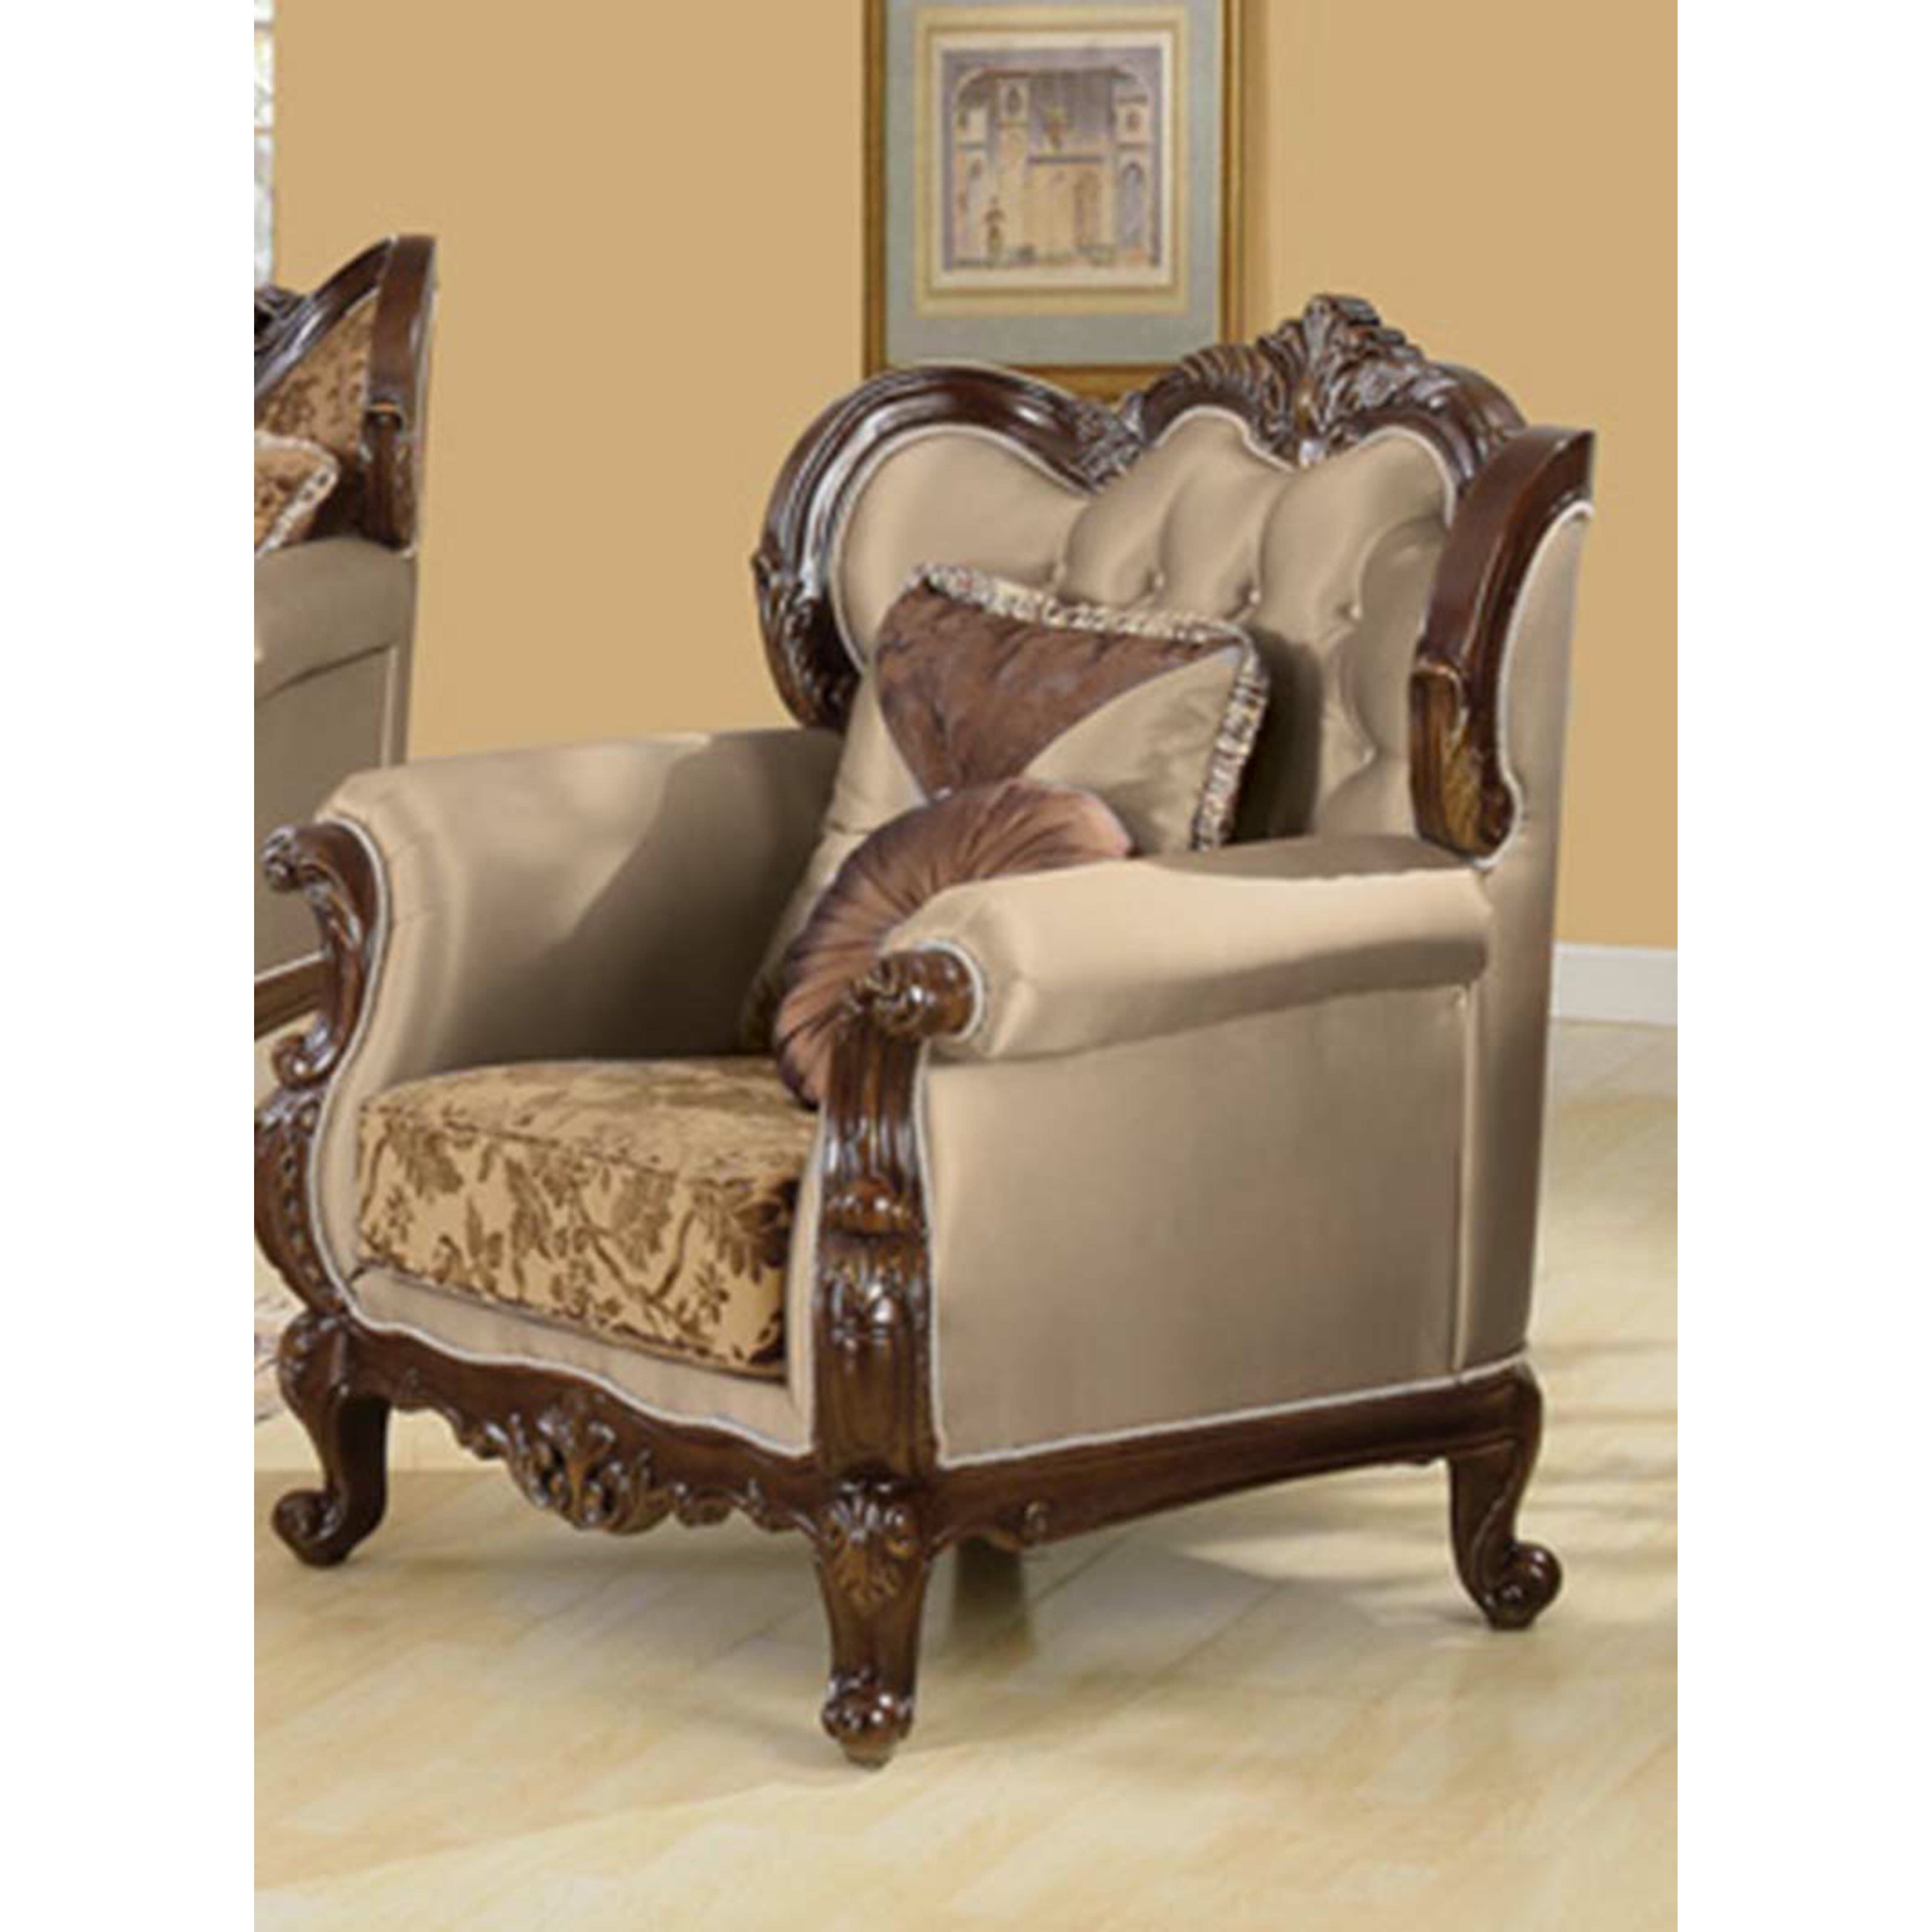 Traditional Living Room Furniture Sets: BestMasterFurniture Jenna 3 Piece Traditional Living Room